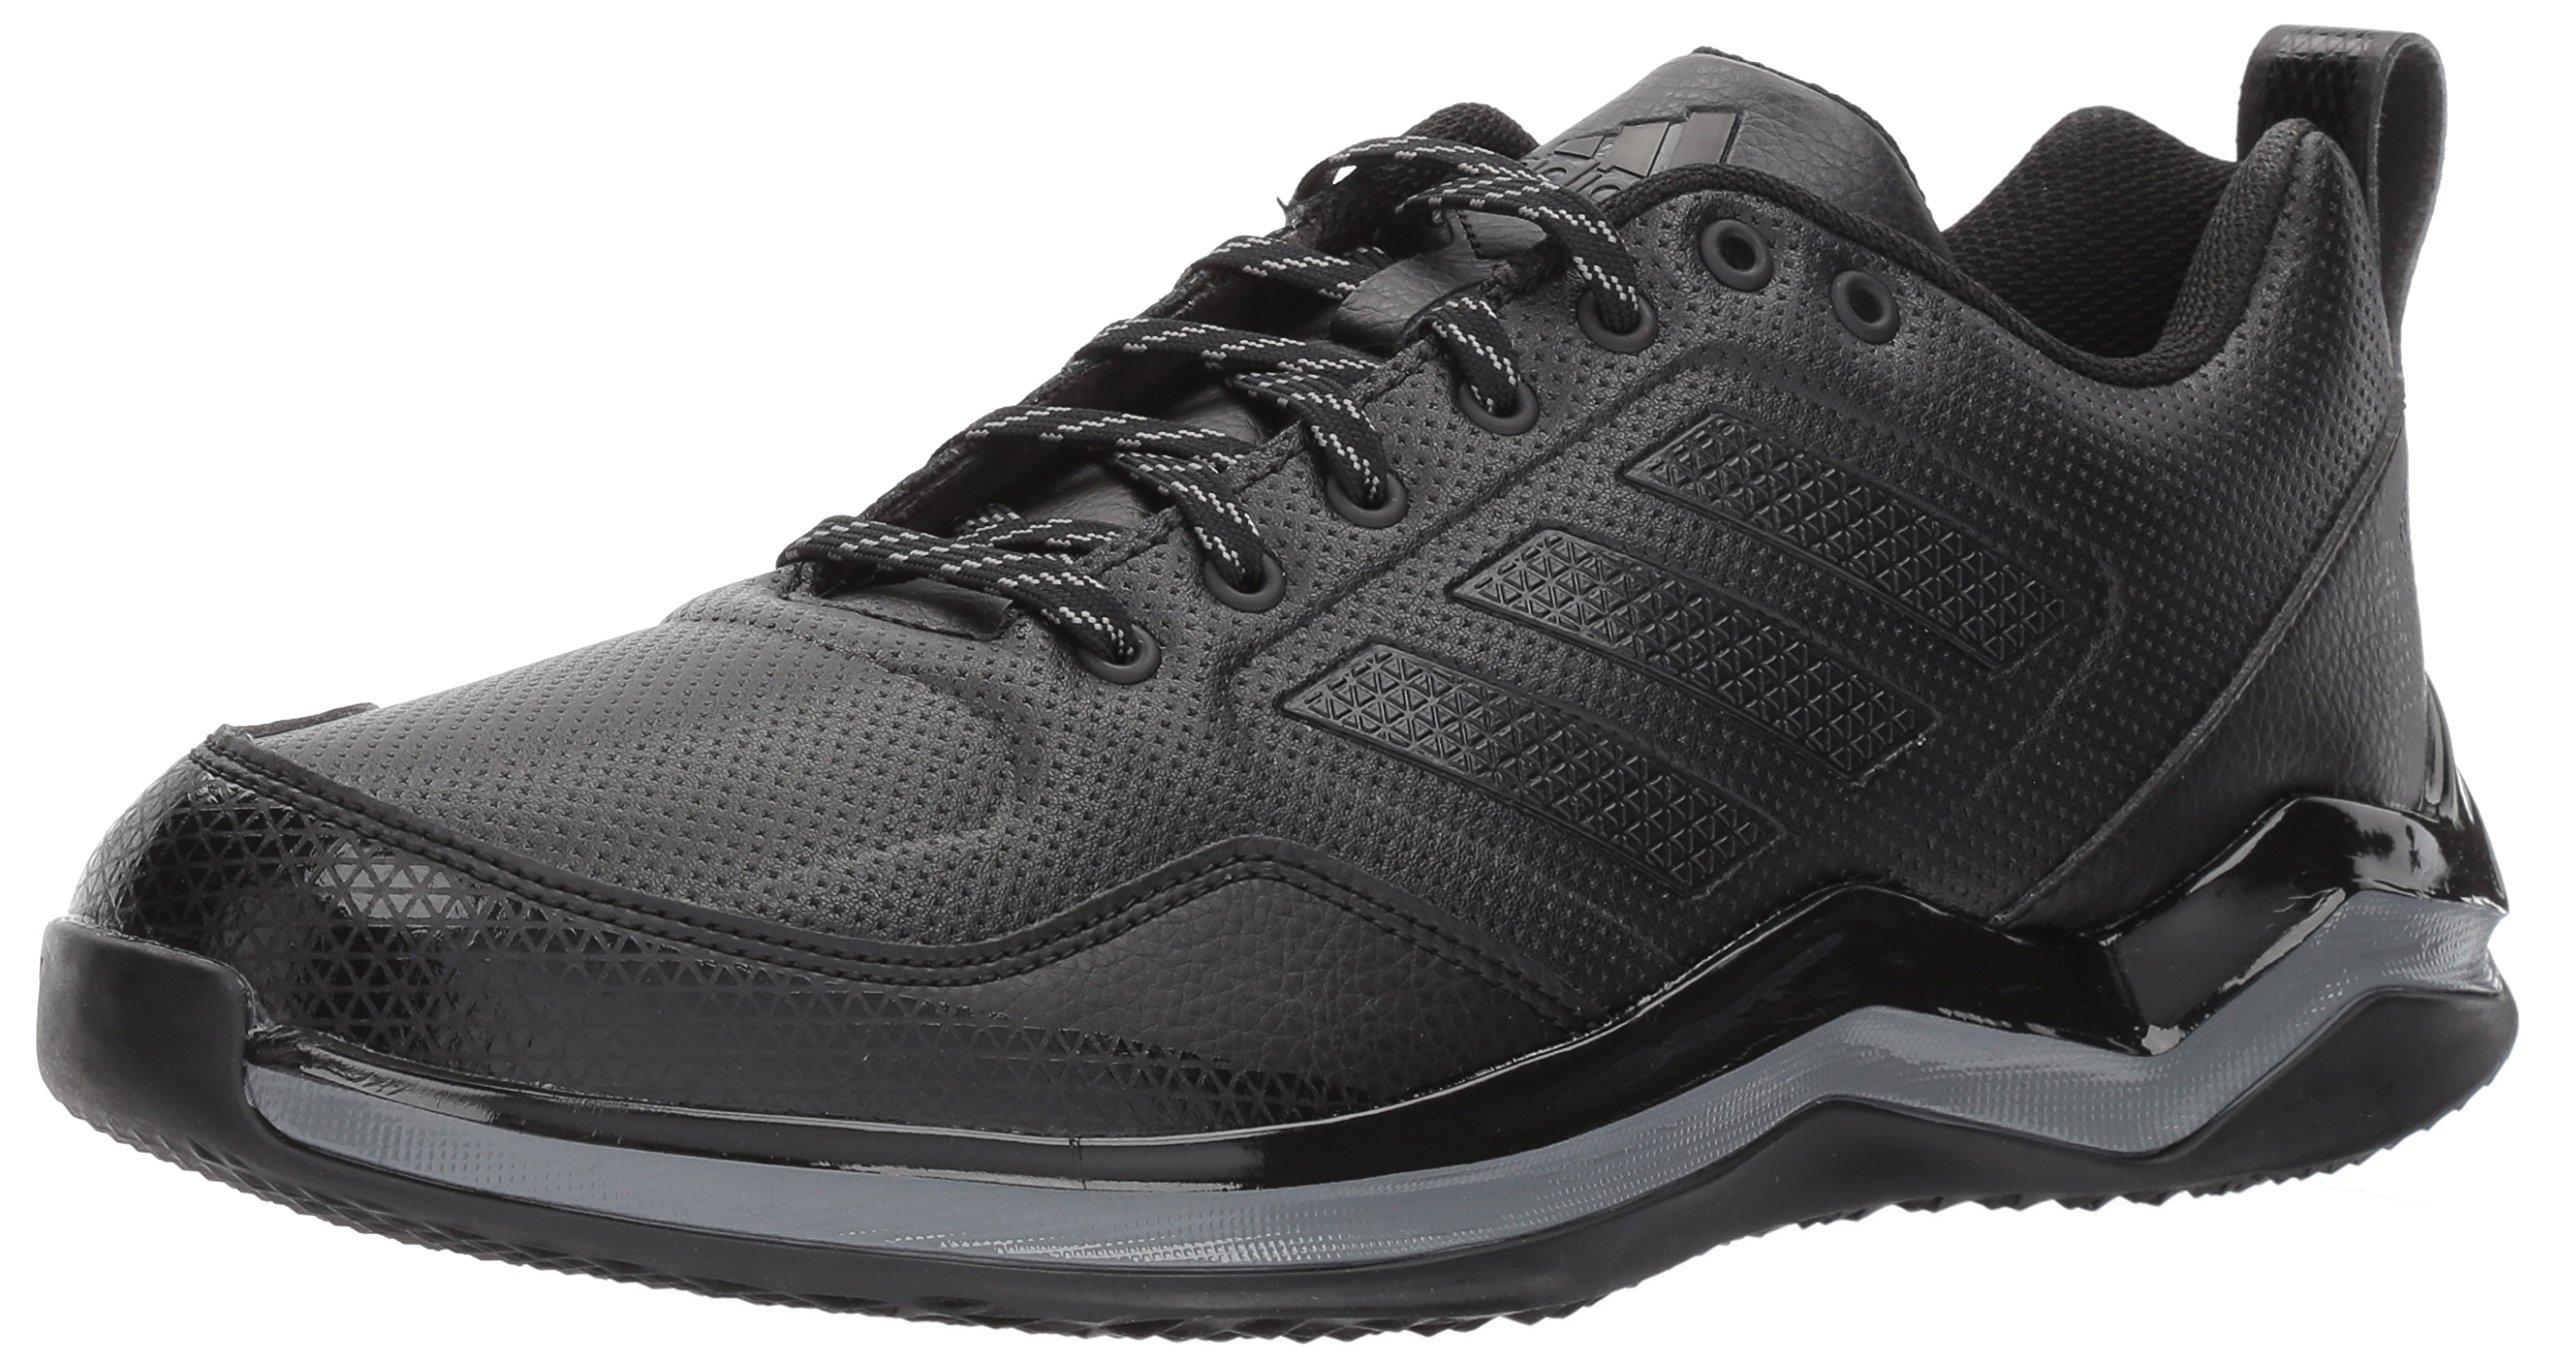 adidas Men's Freak X Carbon Mid Cross Trainer, Black/Black/Iron, 13 Medium US by adidas